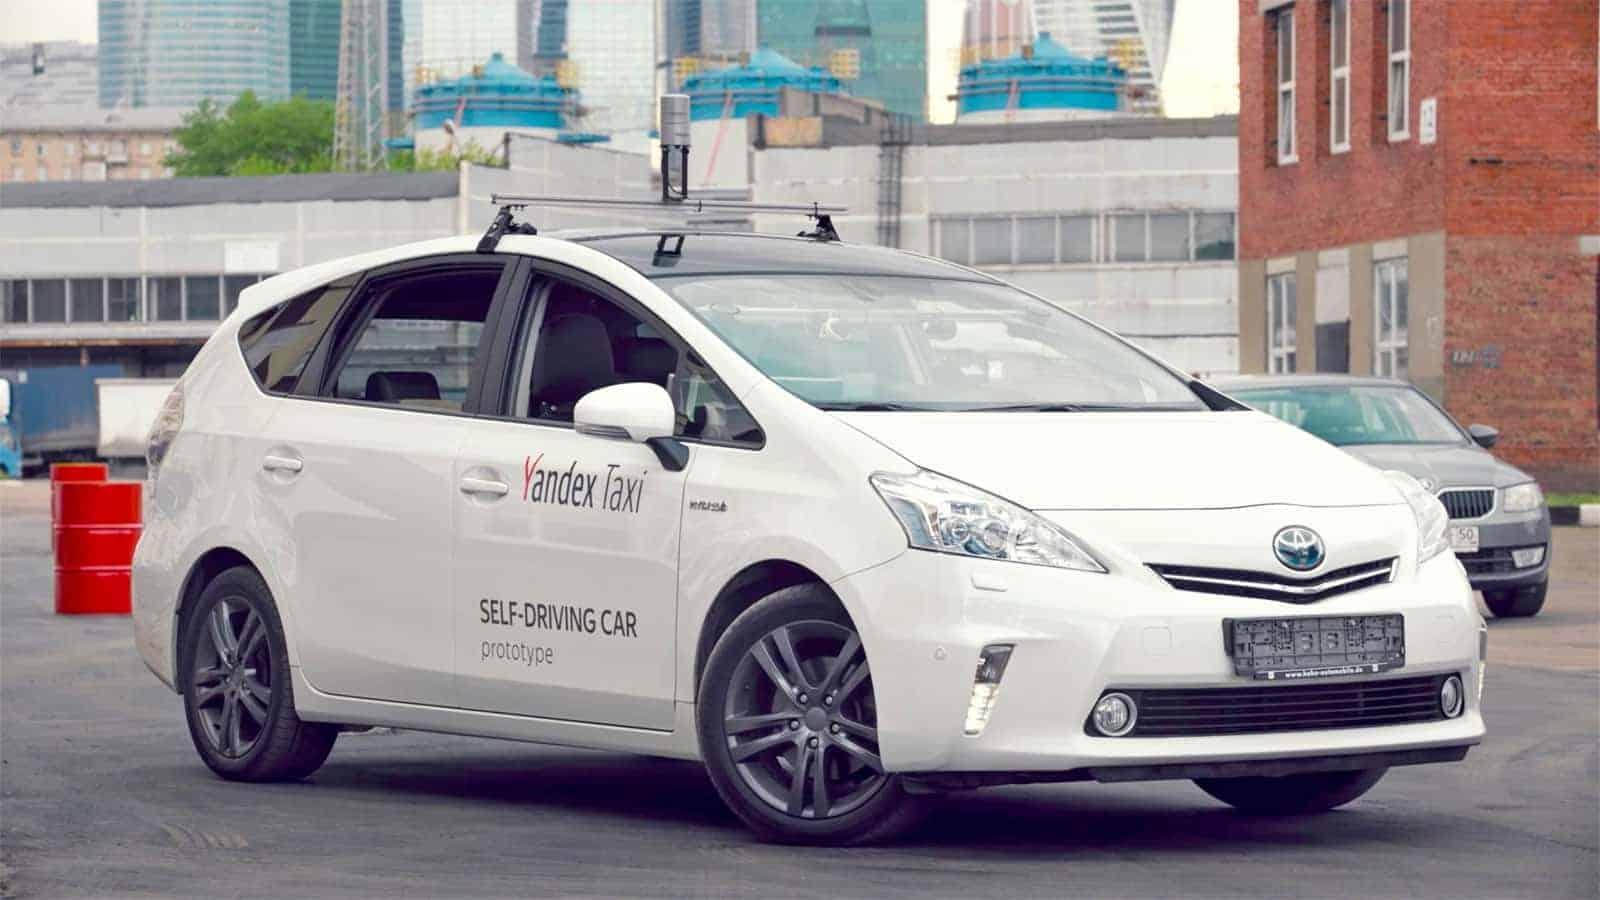 yandex self driving car ed